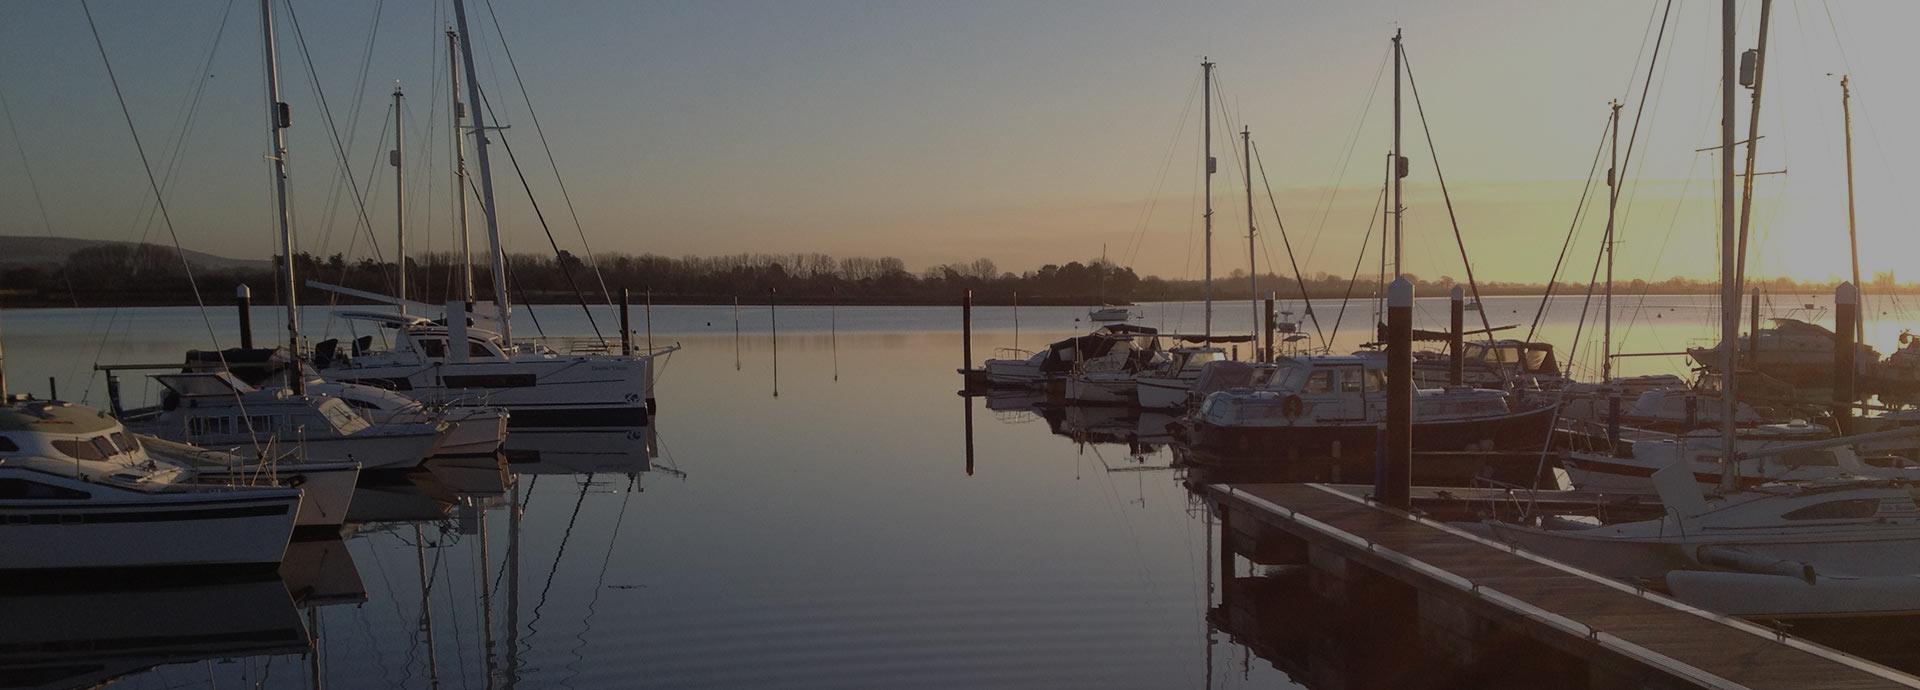 Thornham Marina